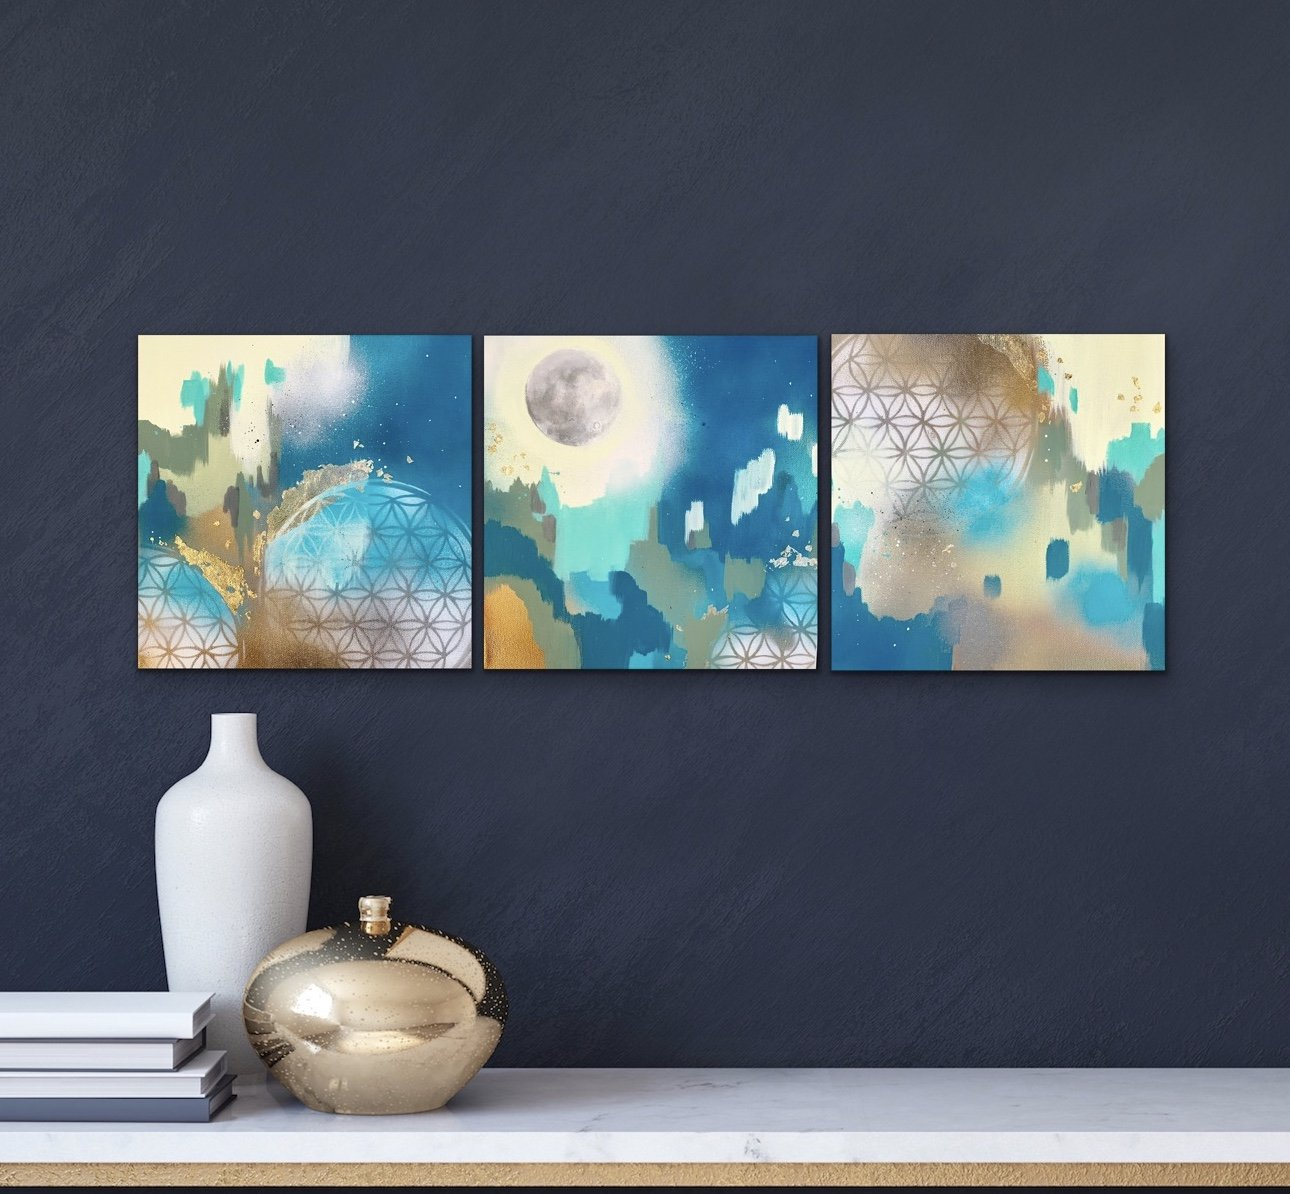 galleries, Leah Guzman, art